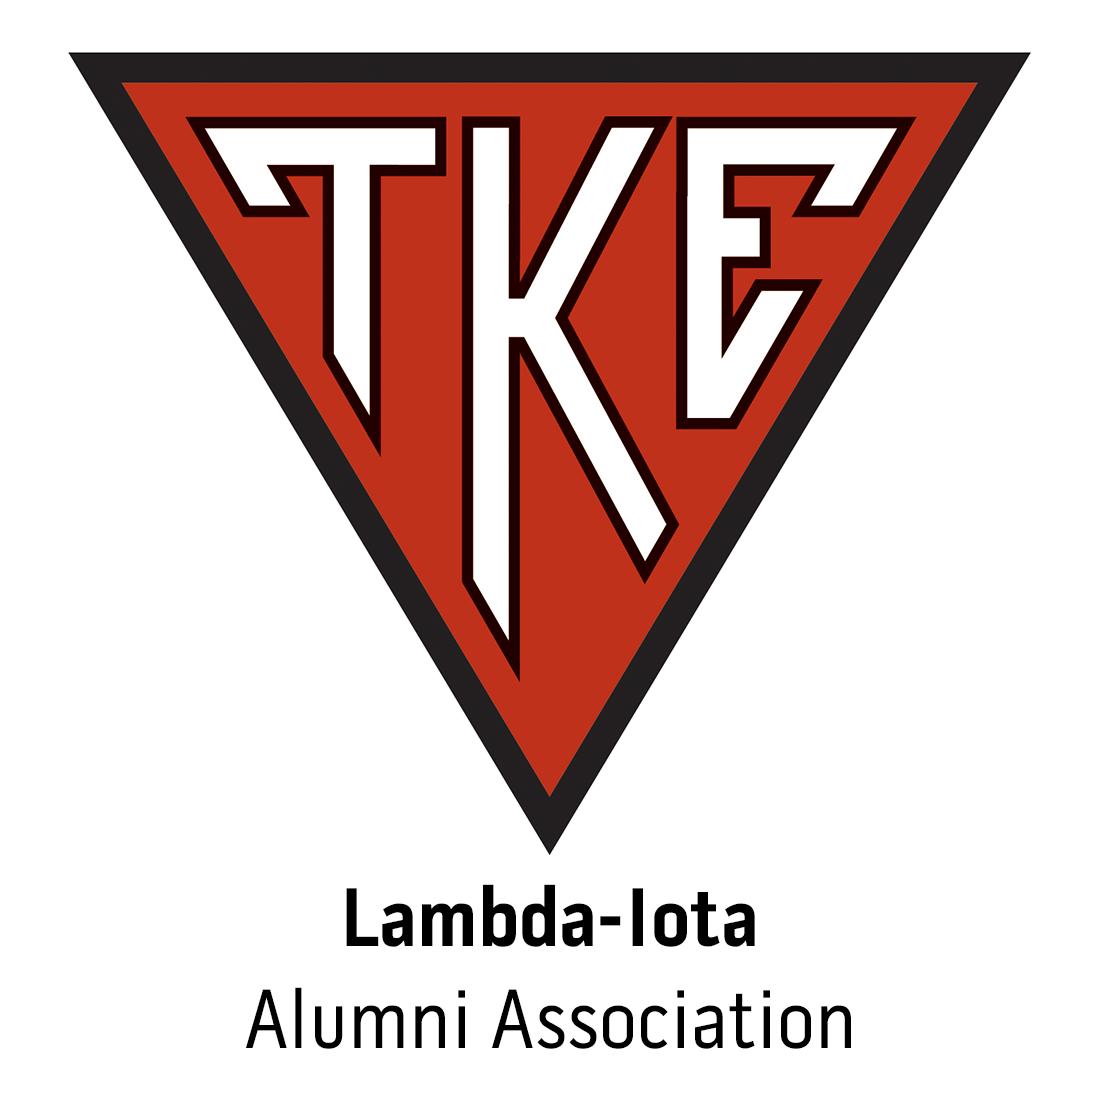 Lambda-Iota Alumni Association Alumni at Florida State University